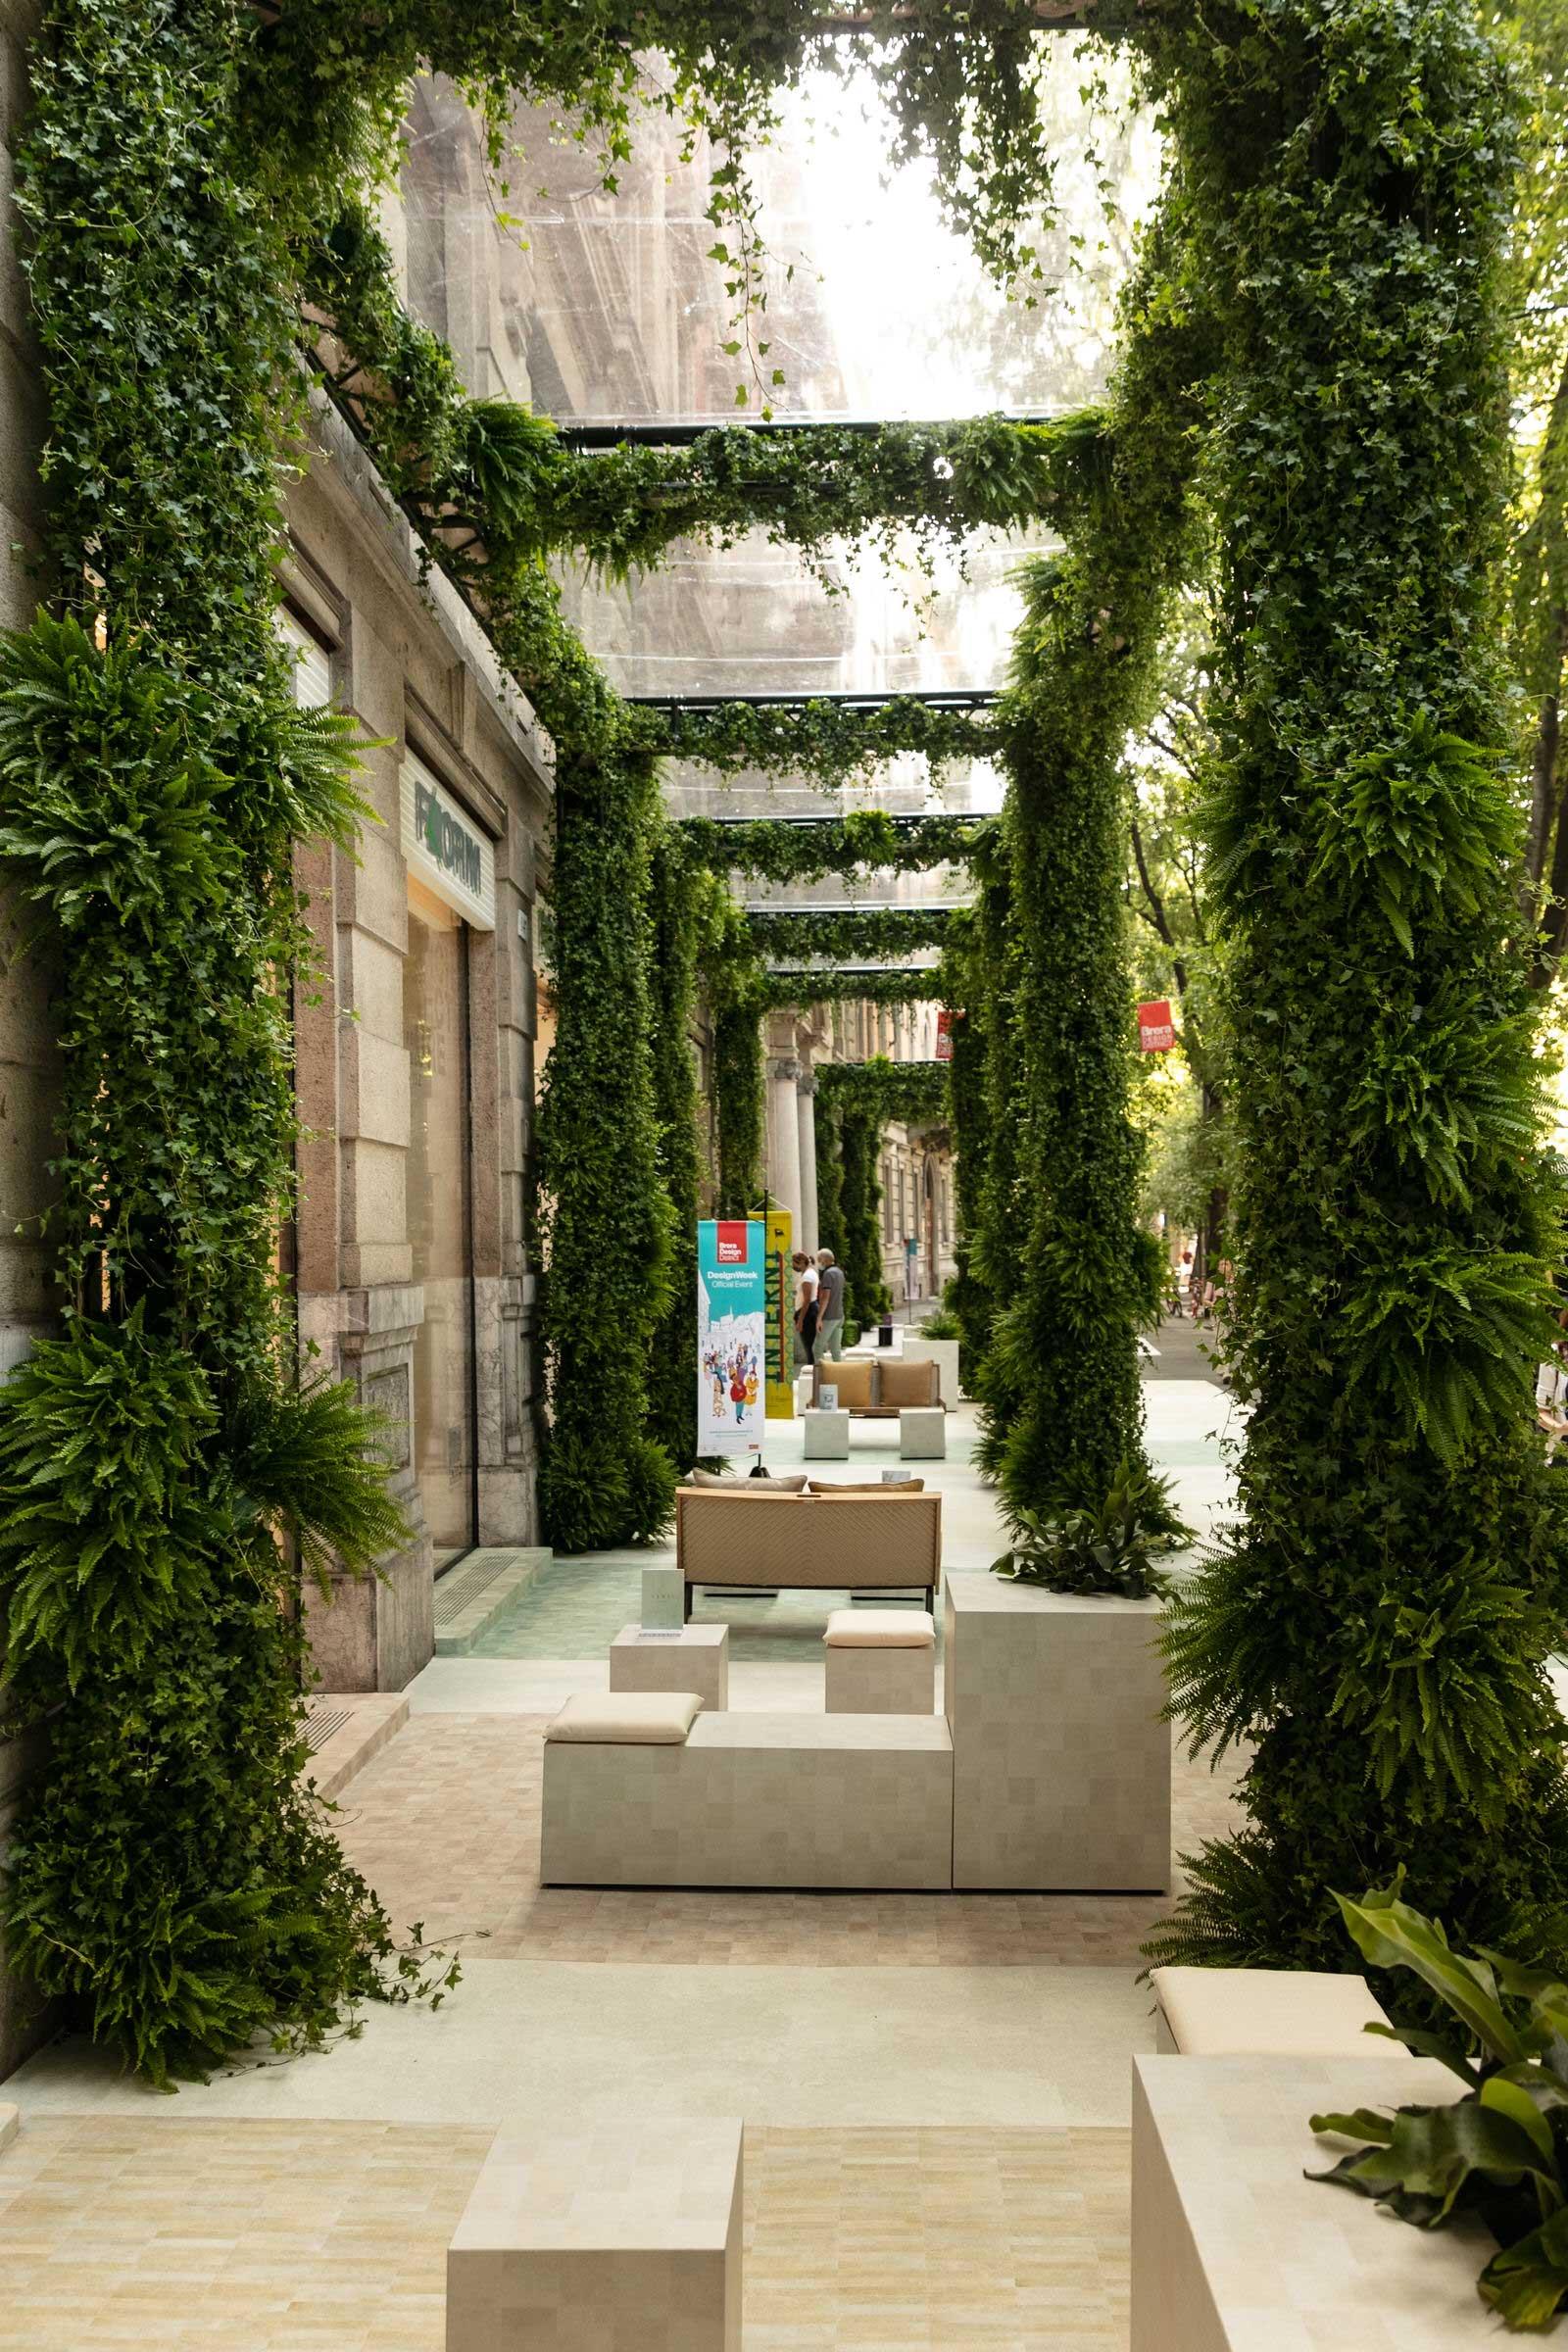 Florim Sensi Pigmenti Installation Milan Design Week 2021 Yellowtrace 06a